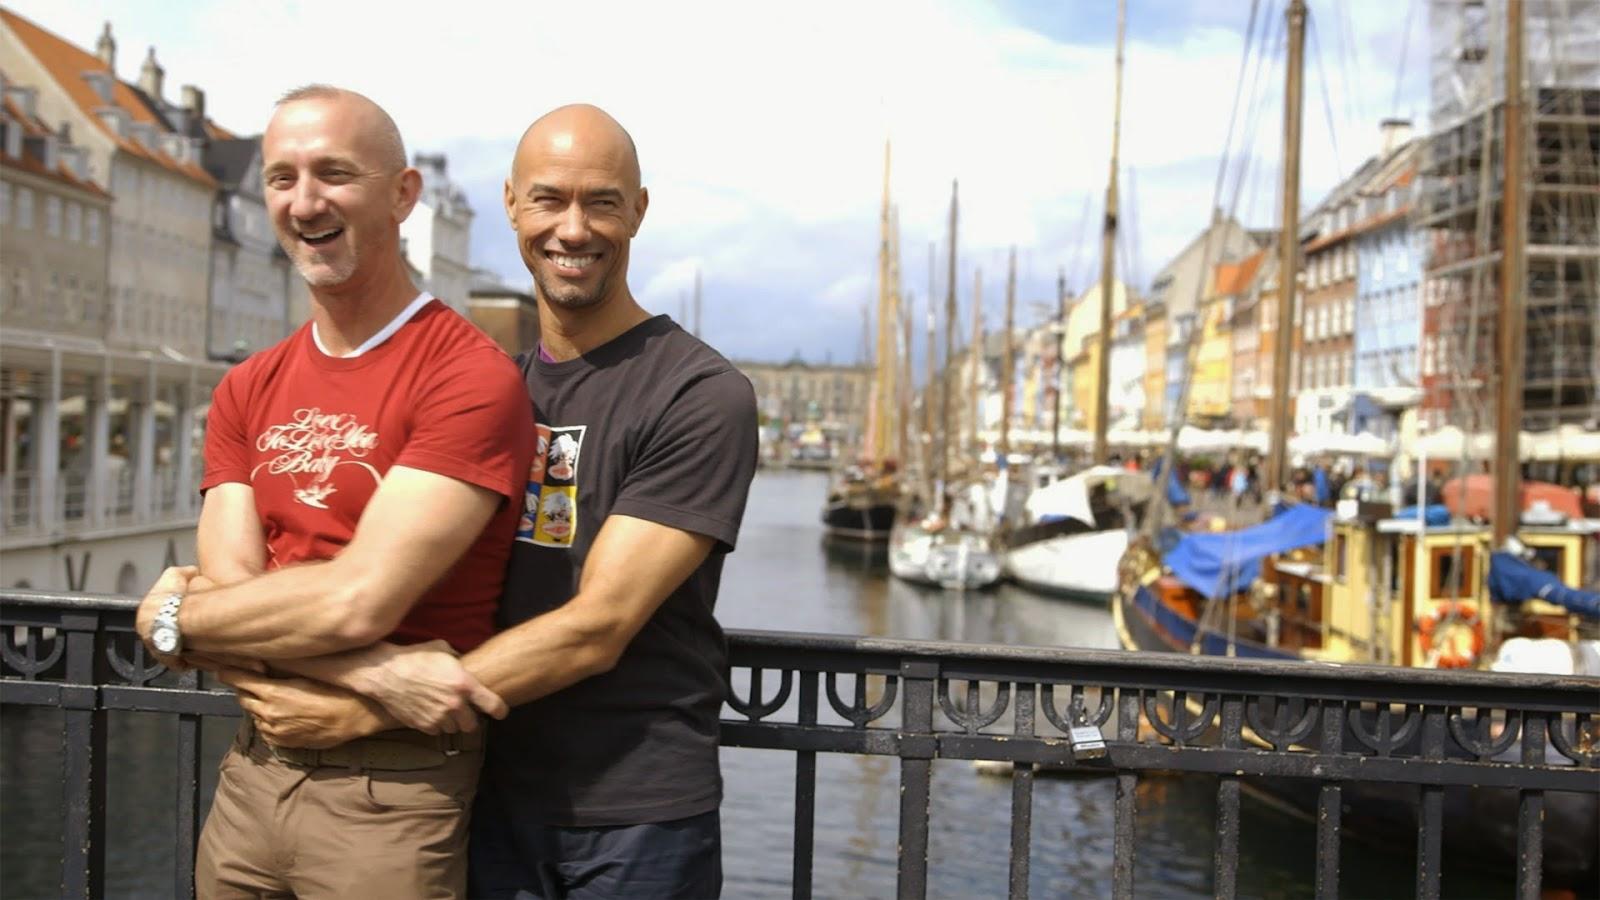 Gay in denmark